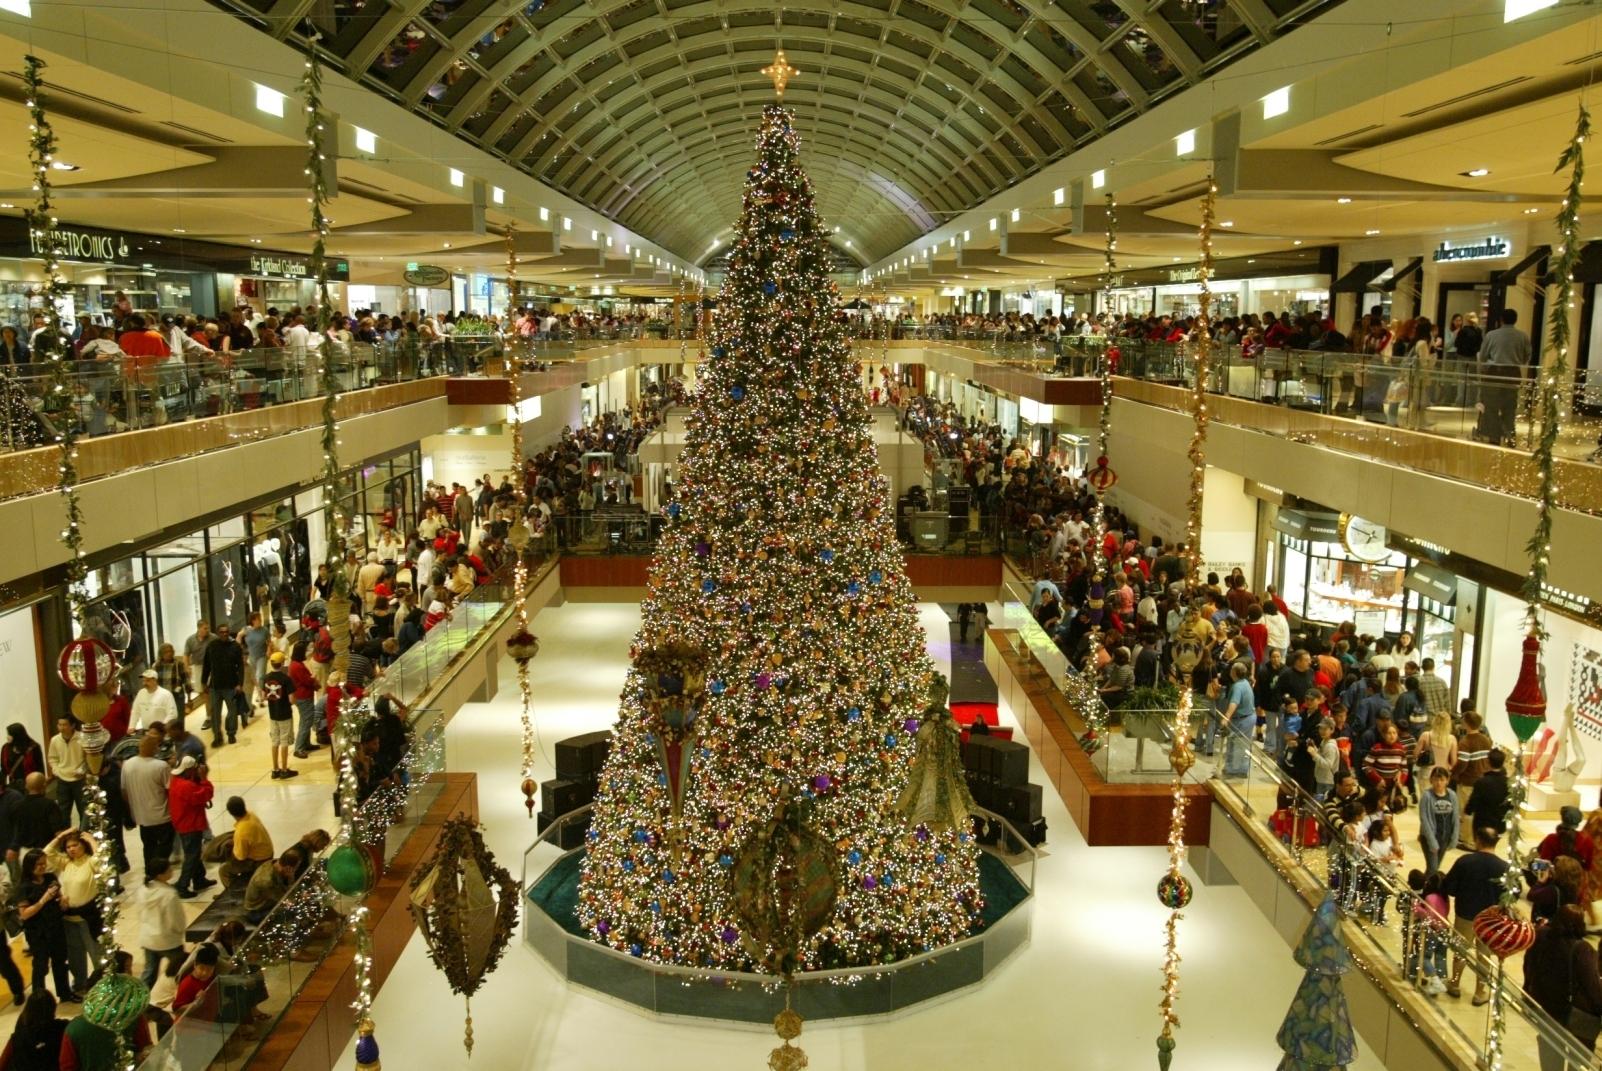 Houston Galleria Christmas Tree Lighting 2020 Galleria set for Christmas tree lighting Saturday